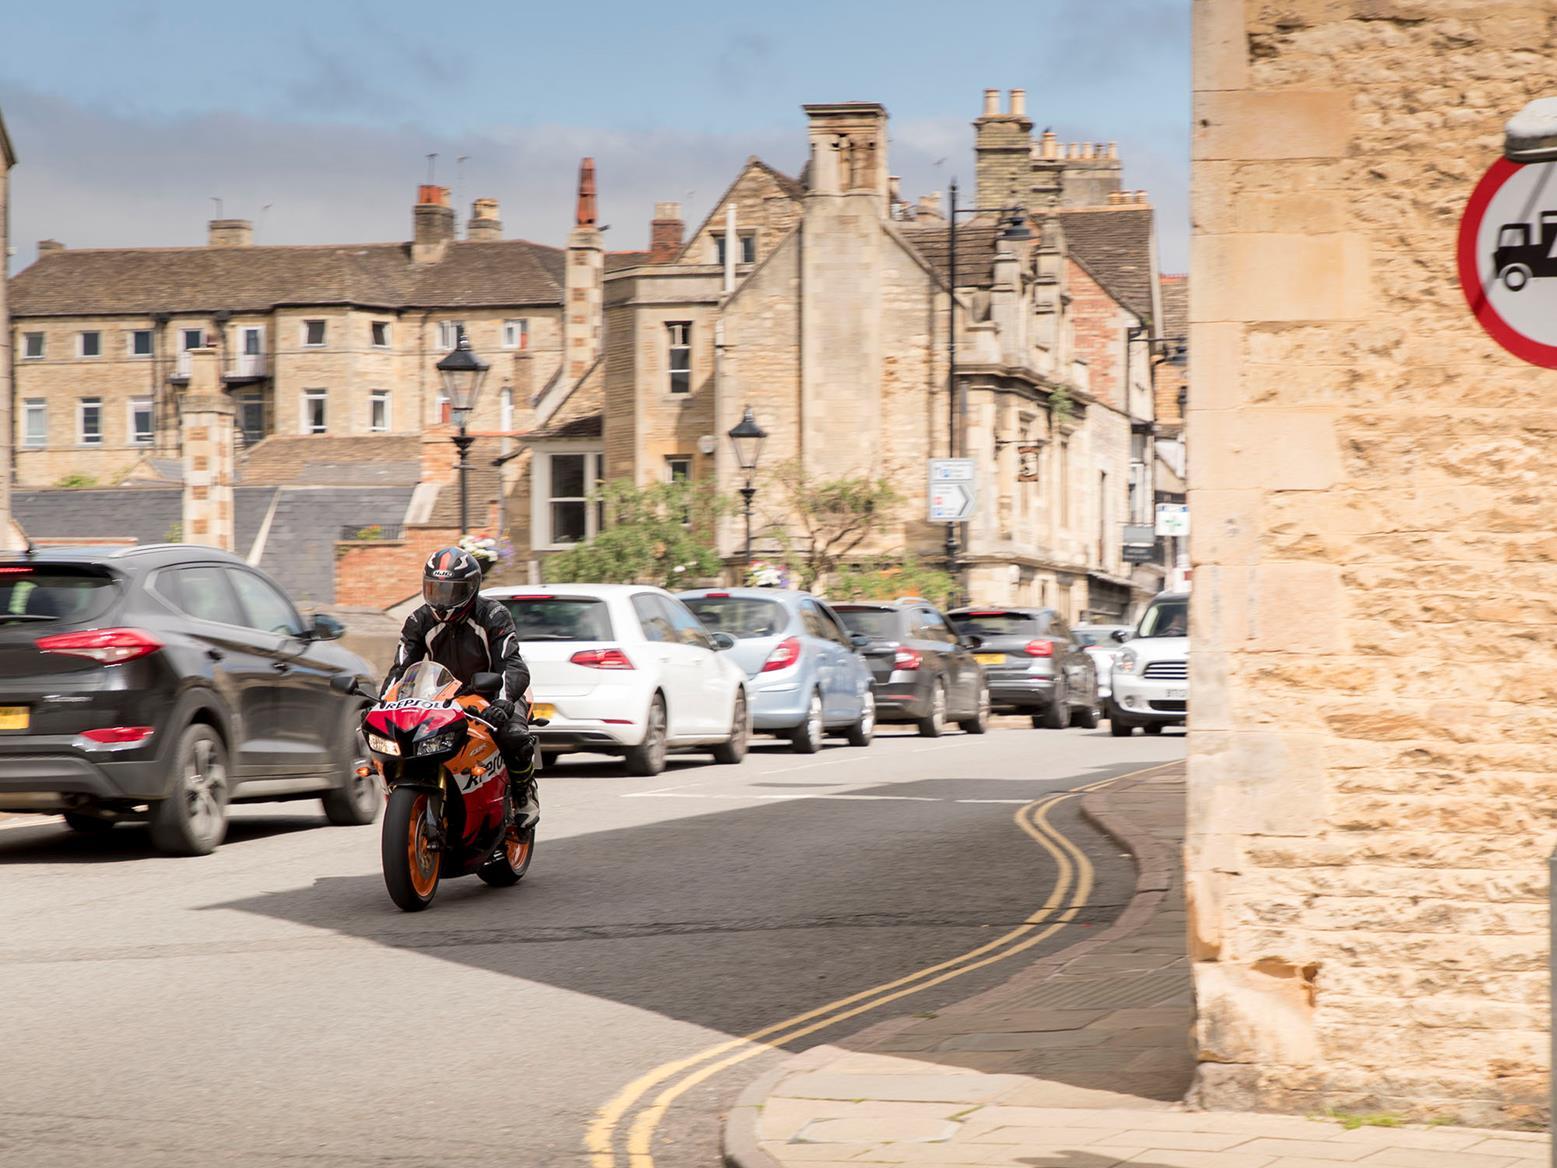 Honda CBR600RR in town